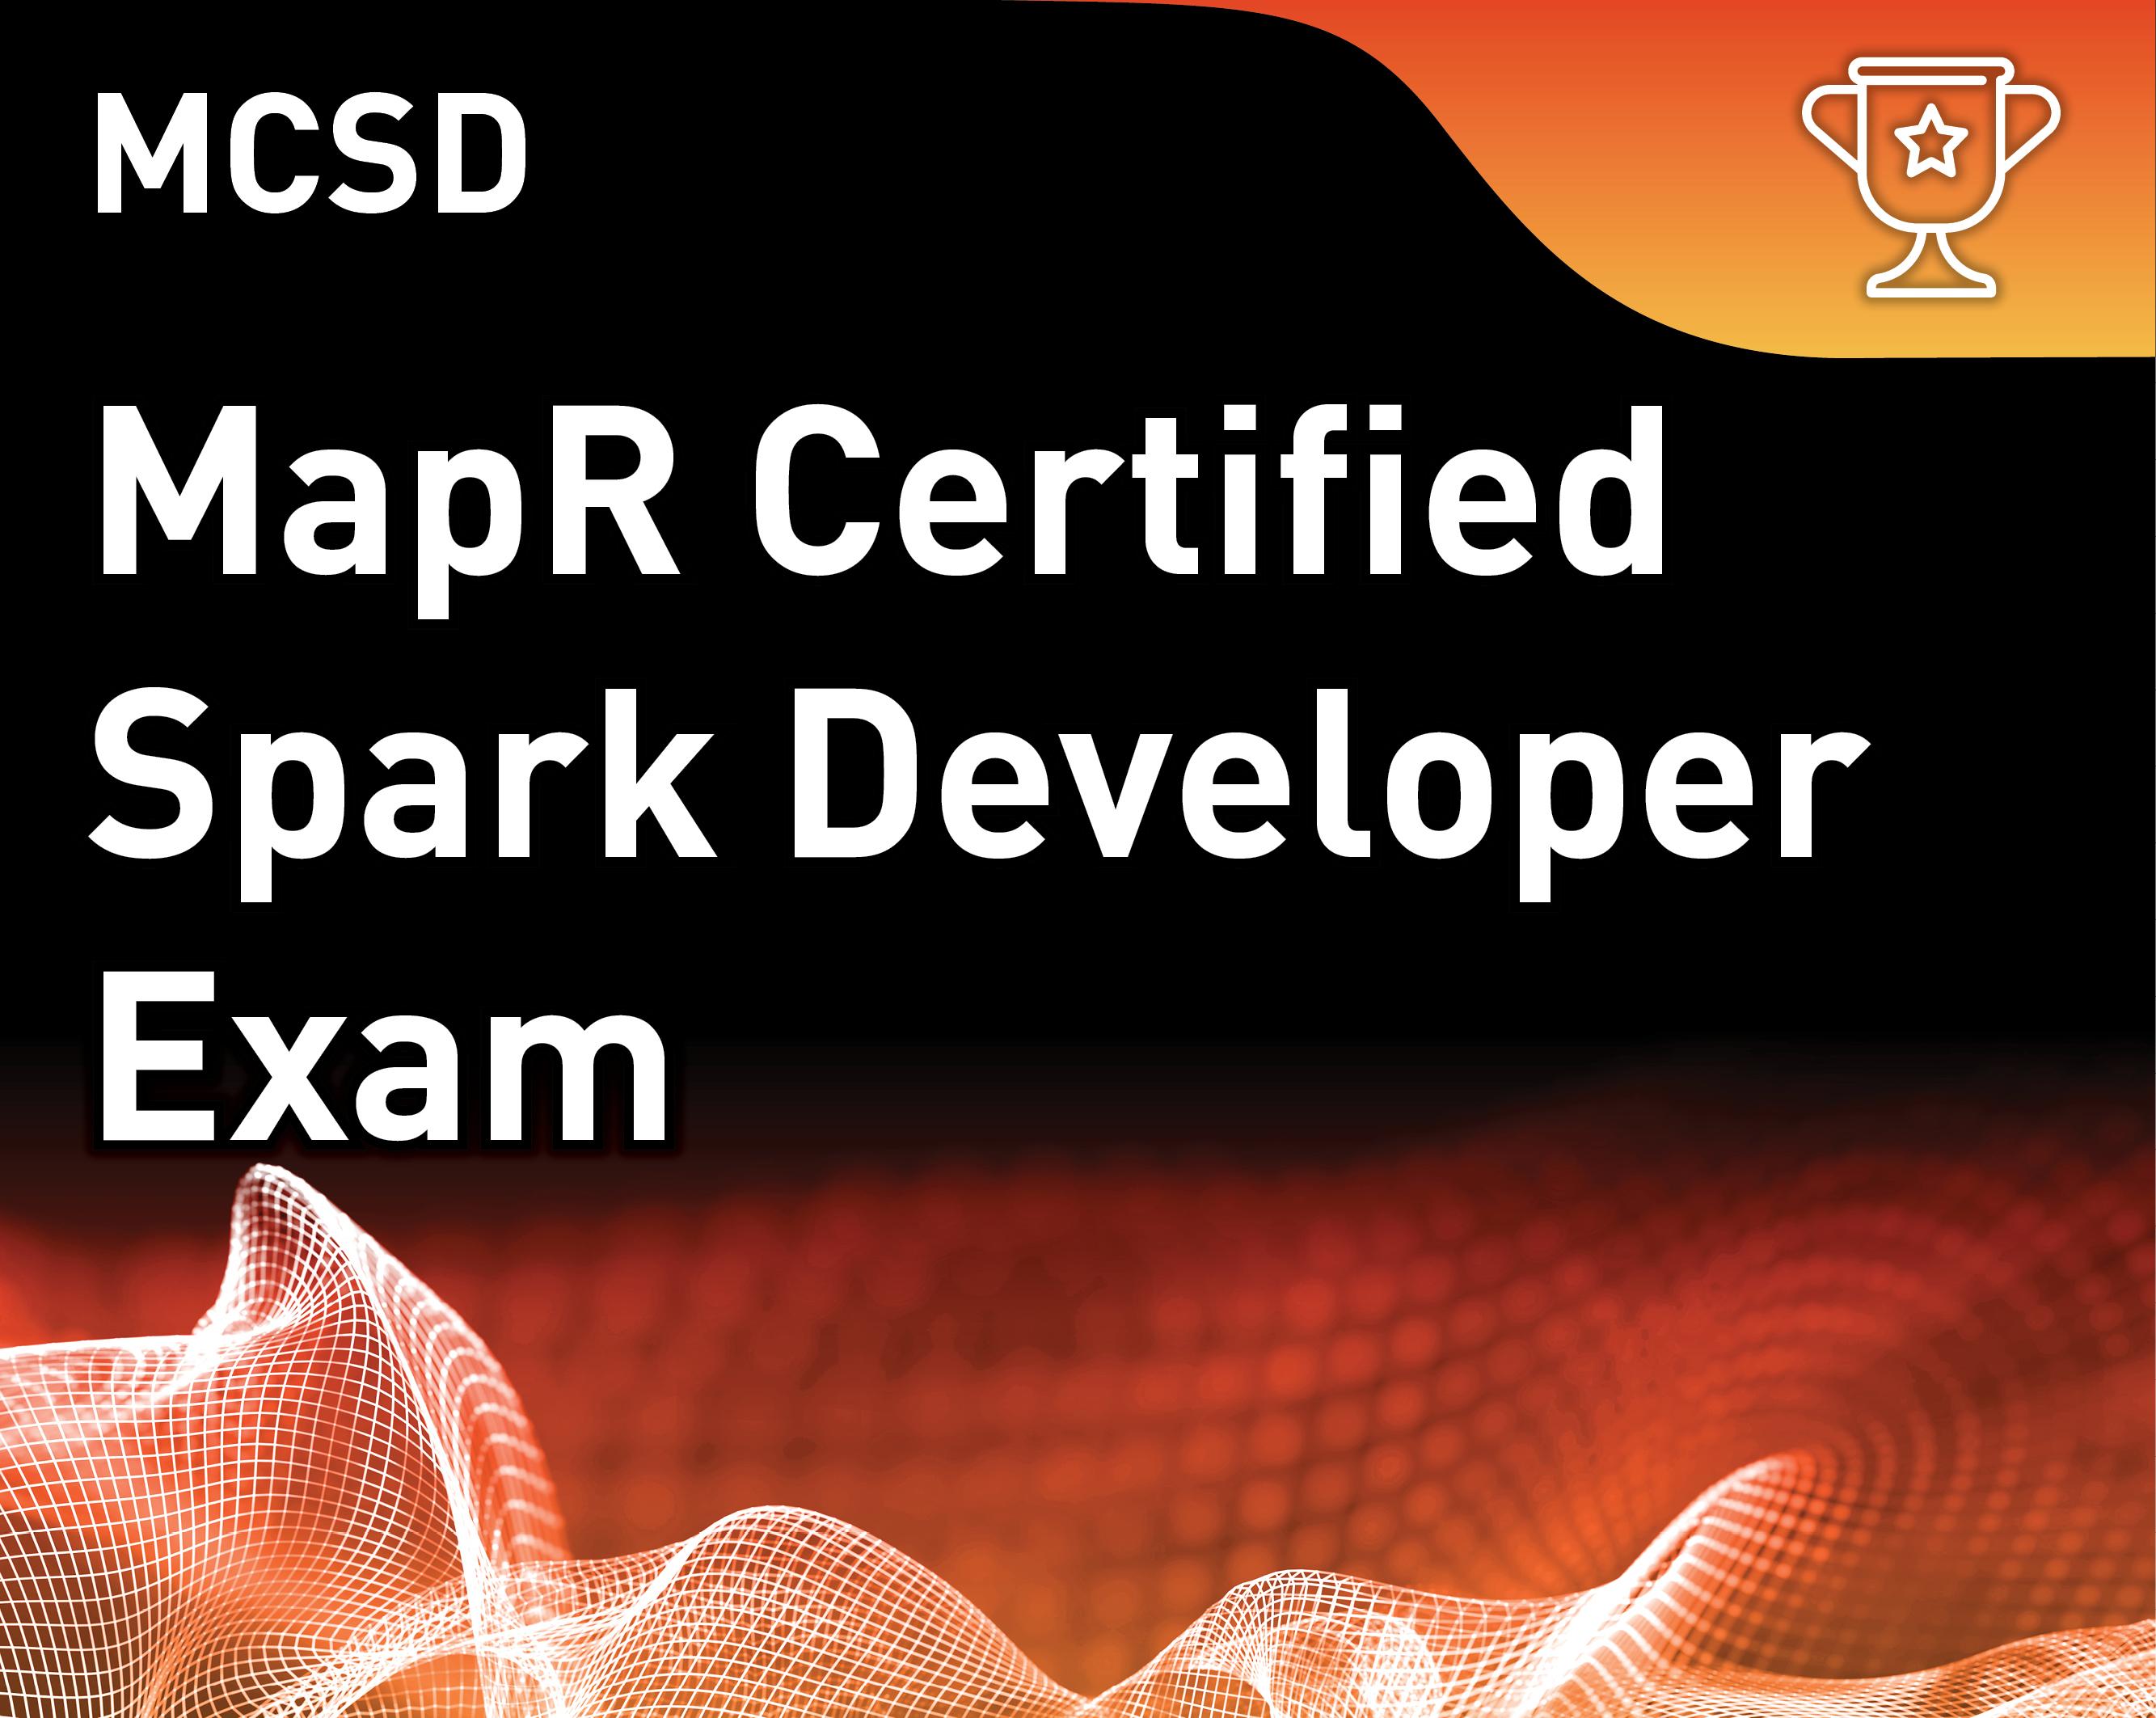 MapR Certified Spark Developer v2.1 (MCSD)